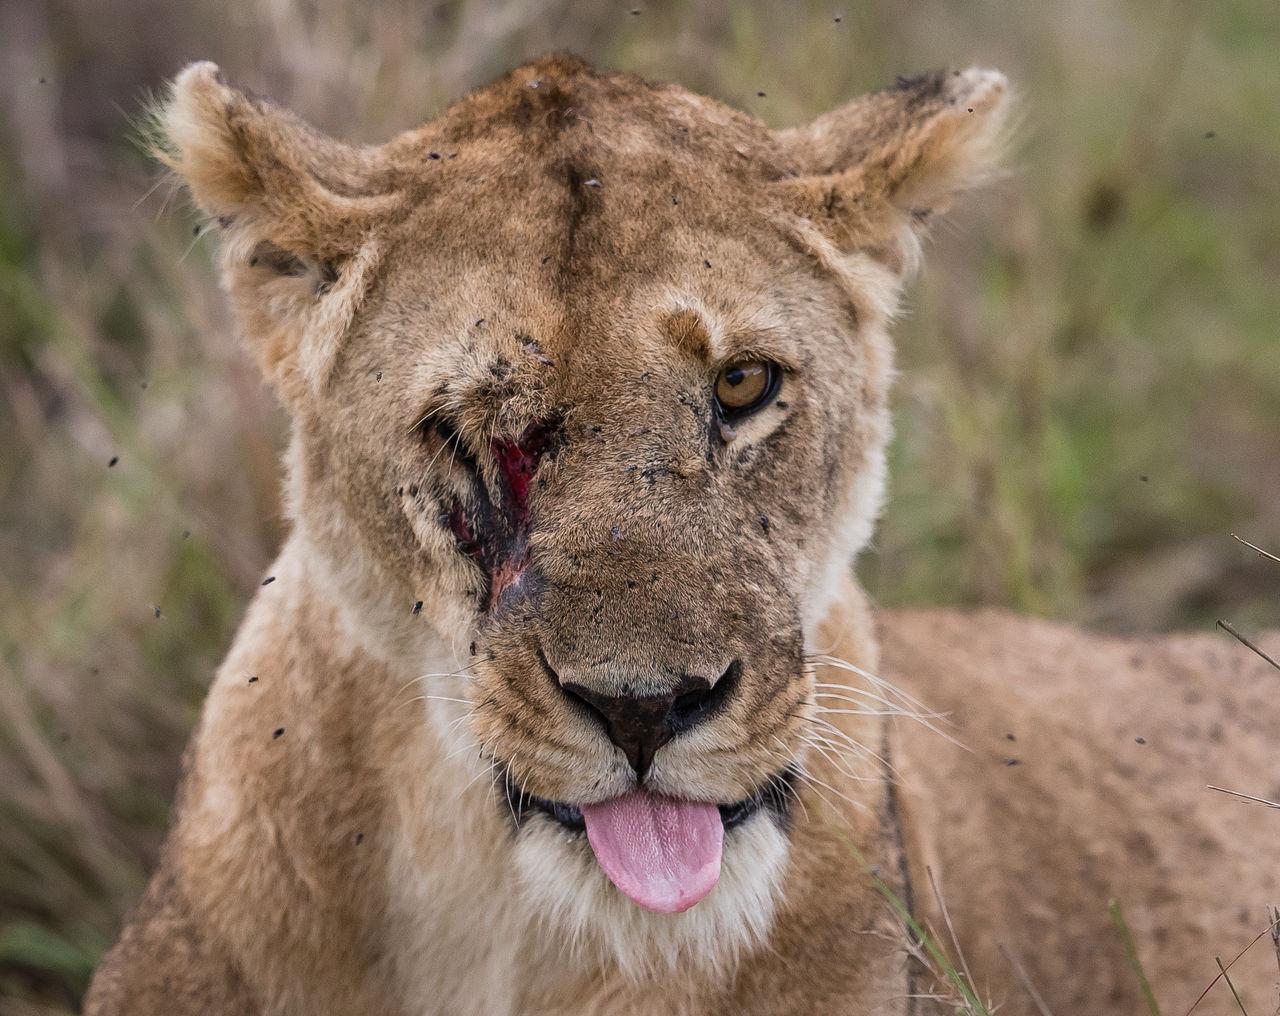 Portrait Of An Injured Lion